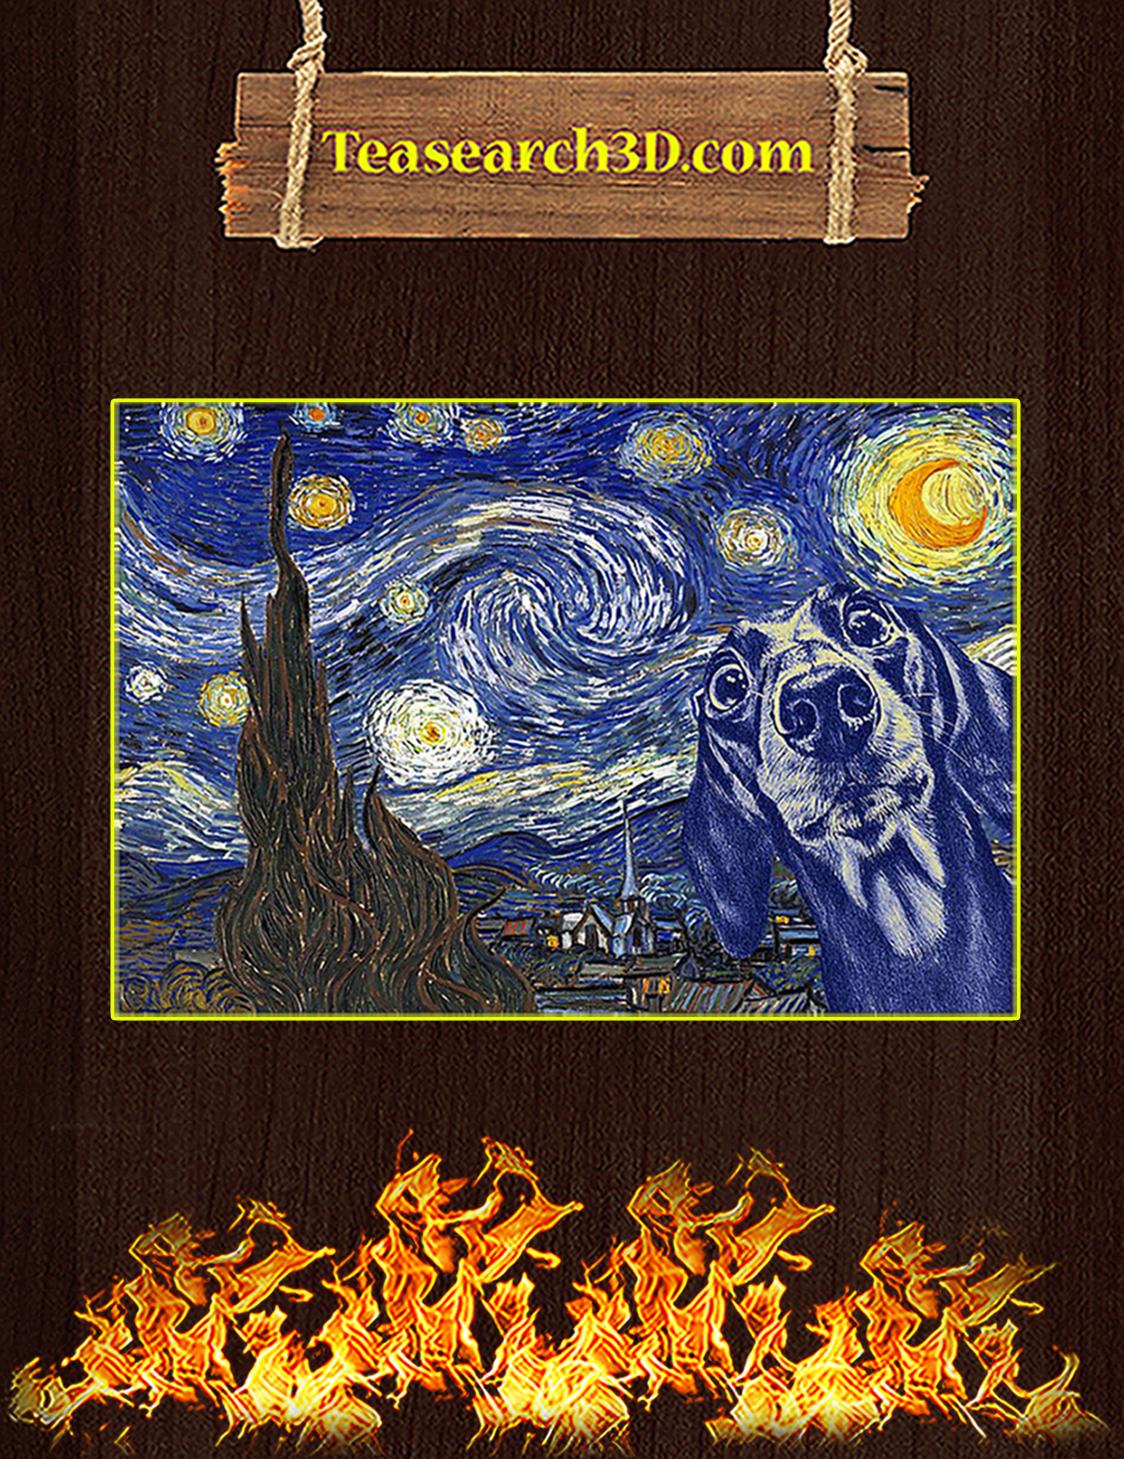 Dachshund van gogh starry night poster A3